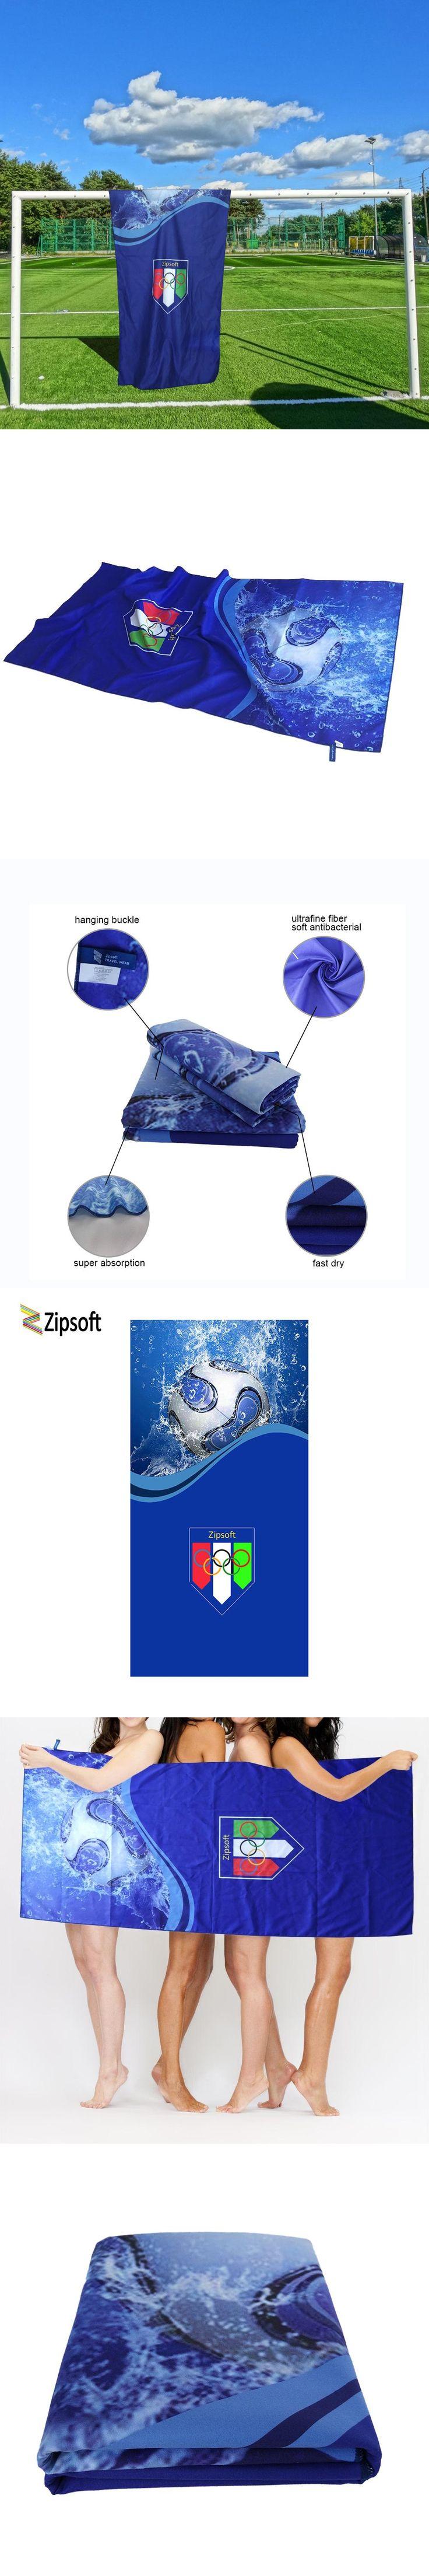 Zipsoft Large Beach Towel Fooball Olympics Bath Towels Adults Serviette Plage Sports Yoga Mat Microfiber Compressed Blanket 2017